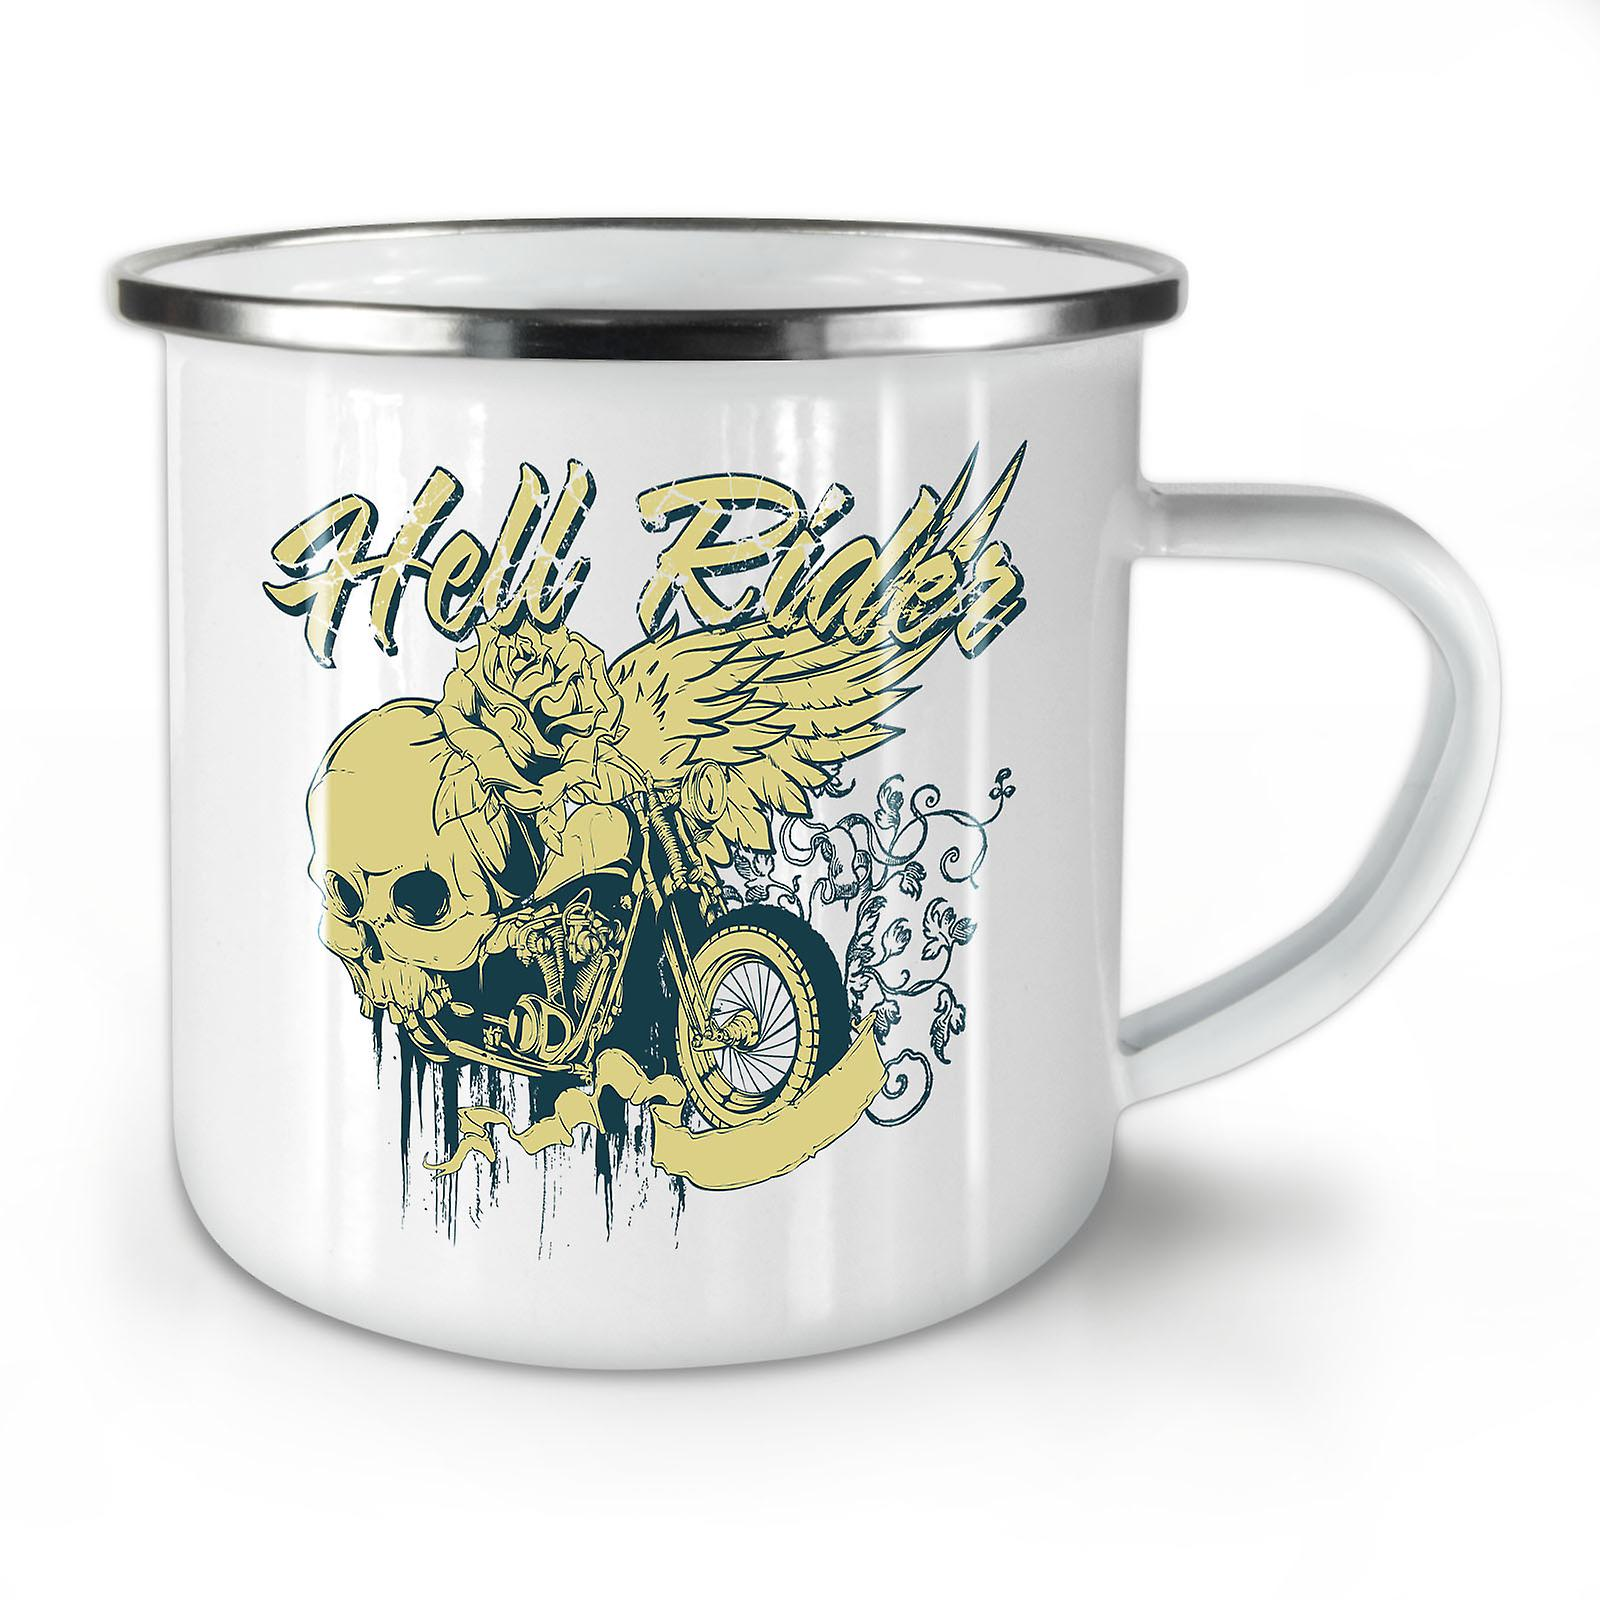 Mug10 In Enamel Metal OzWellcoda Coffee Riding Biker New Whitetea Hell PkwX8nON0